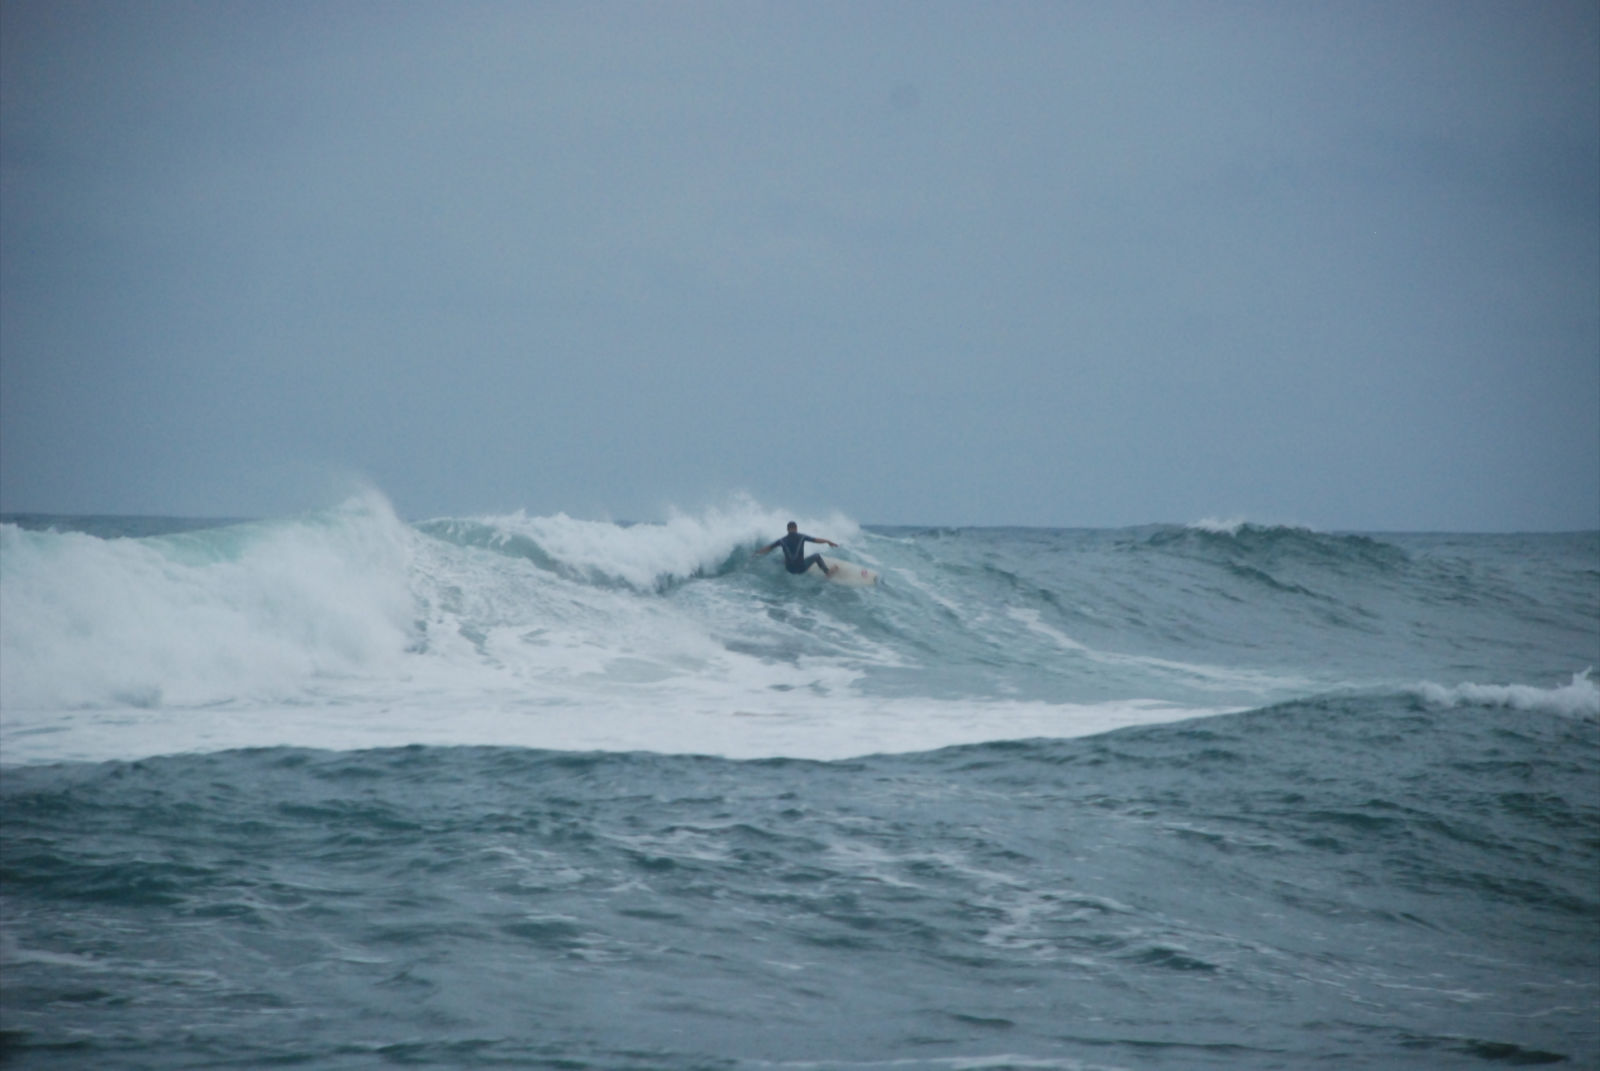 Fernando Ferrao negociando una ola complicada. Foto Juanra